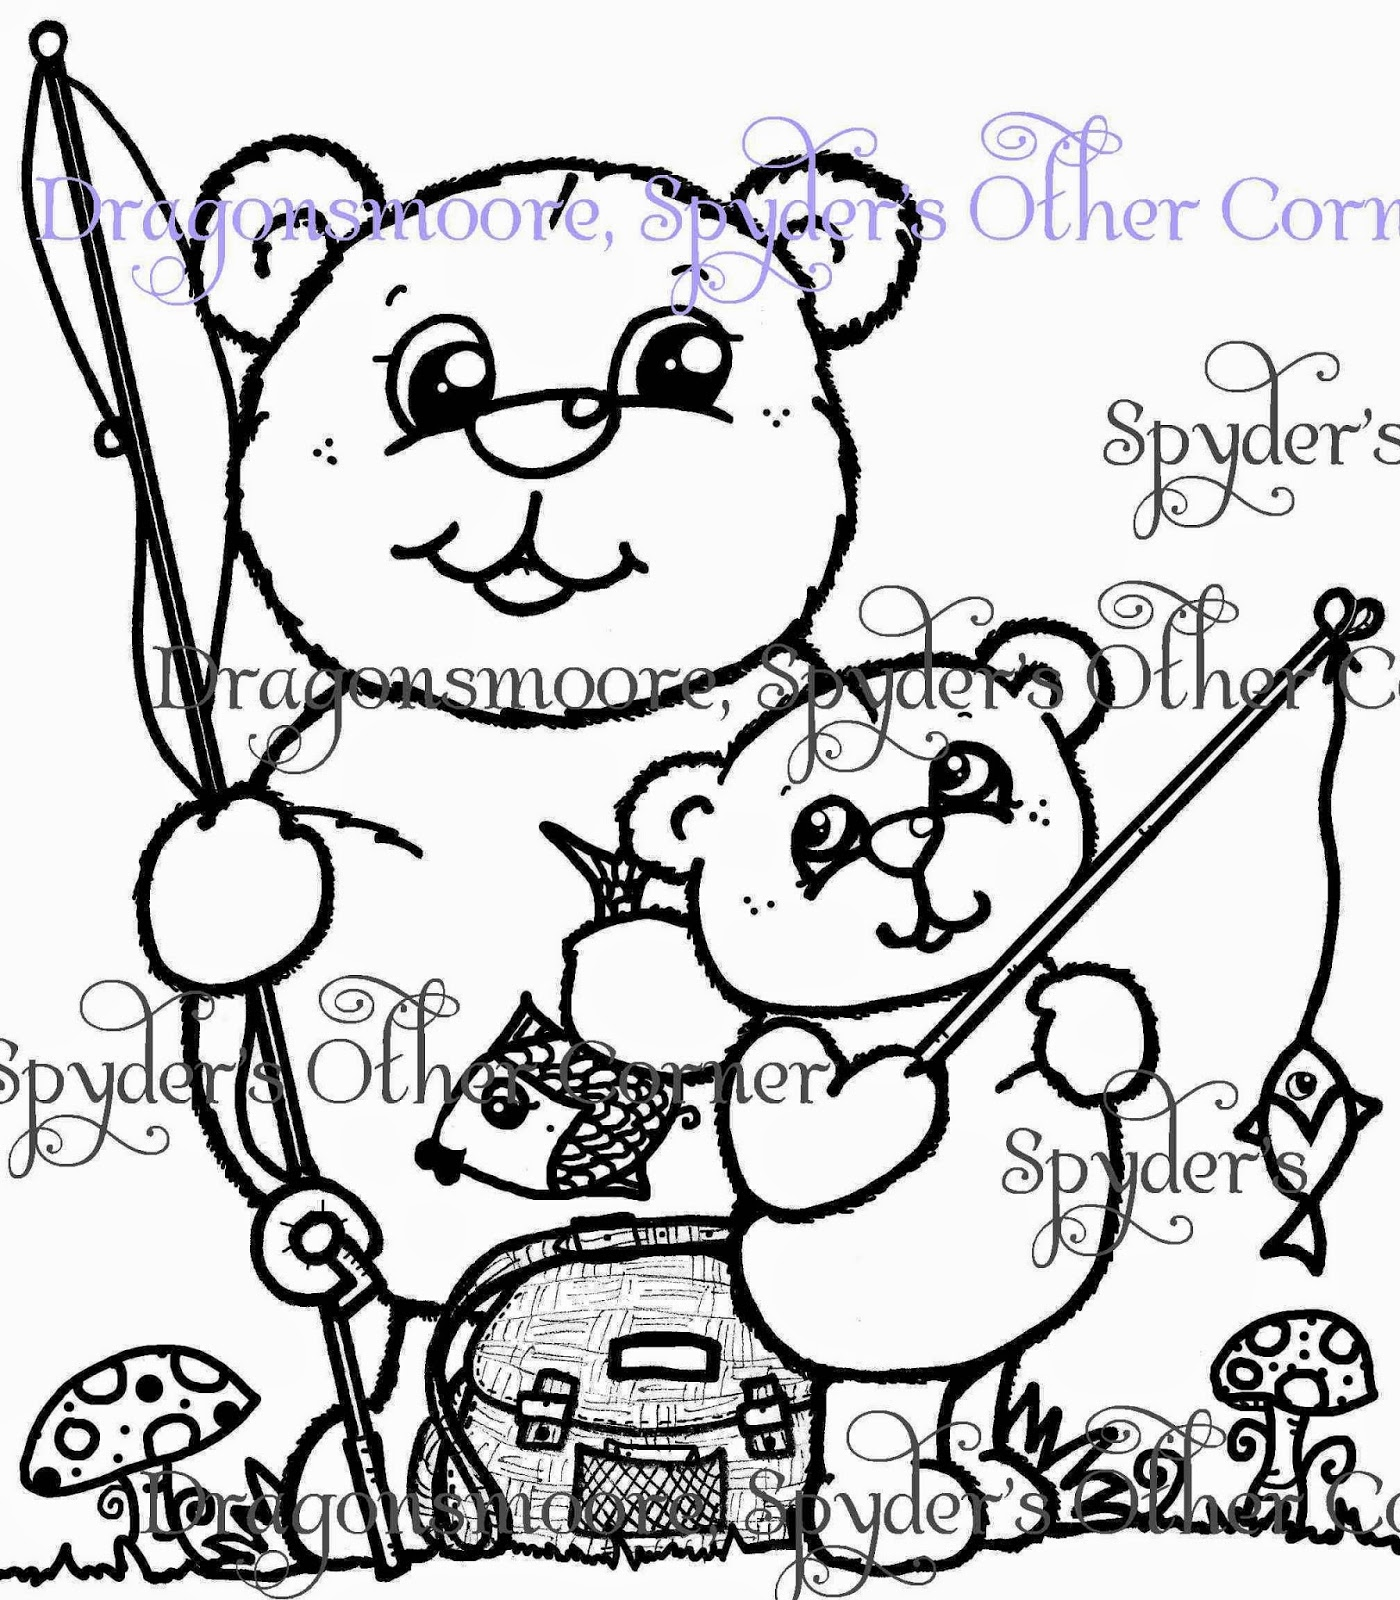 http://2.bp.blogspot.com/-HLxsZ_s6SYk/U45YyAkCXTI/AAAAAAAAc90/tX49LqcfLB0/s1600/Spyder%2527s+Corner_Let%2527s+Go+Fishing%2521-300dpi+gs+cos_f-wm.jpg